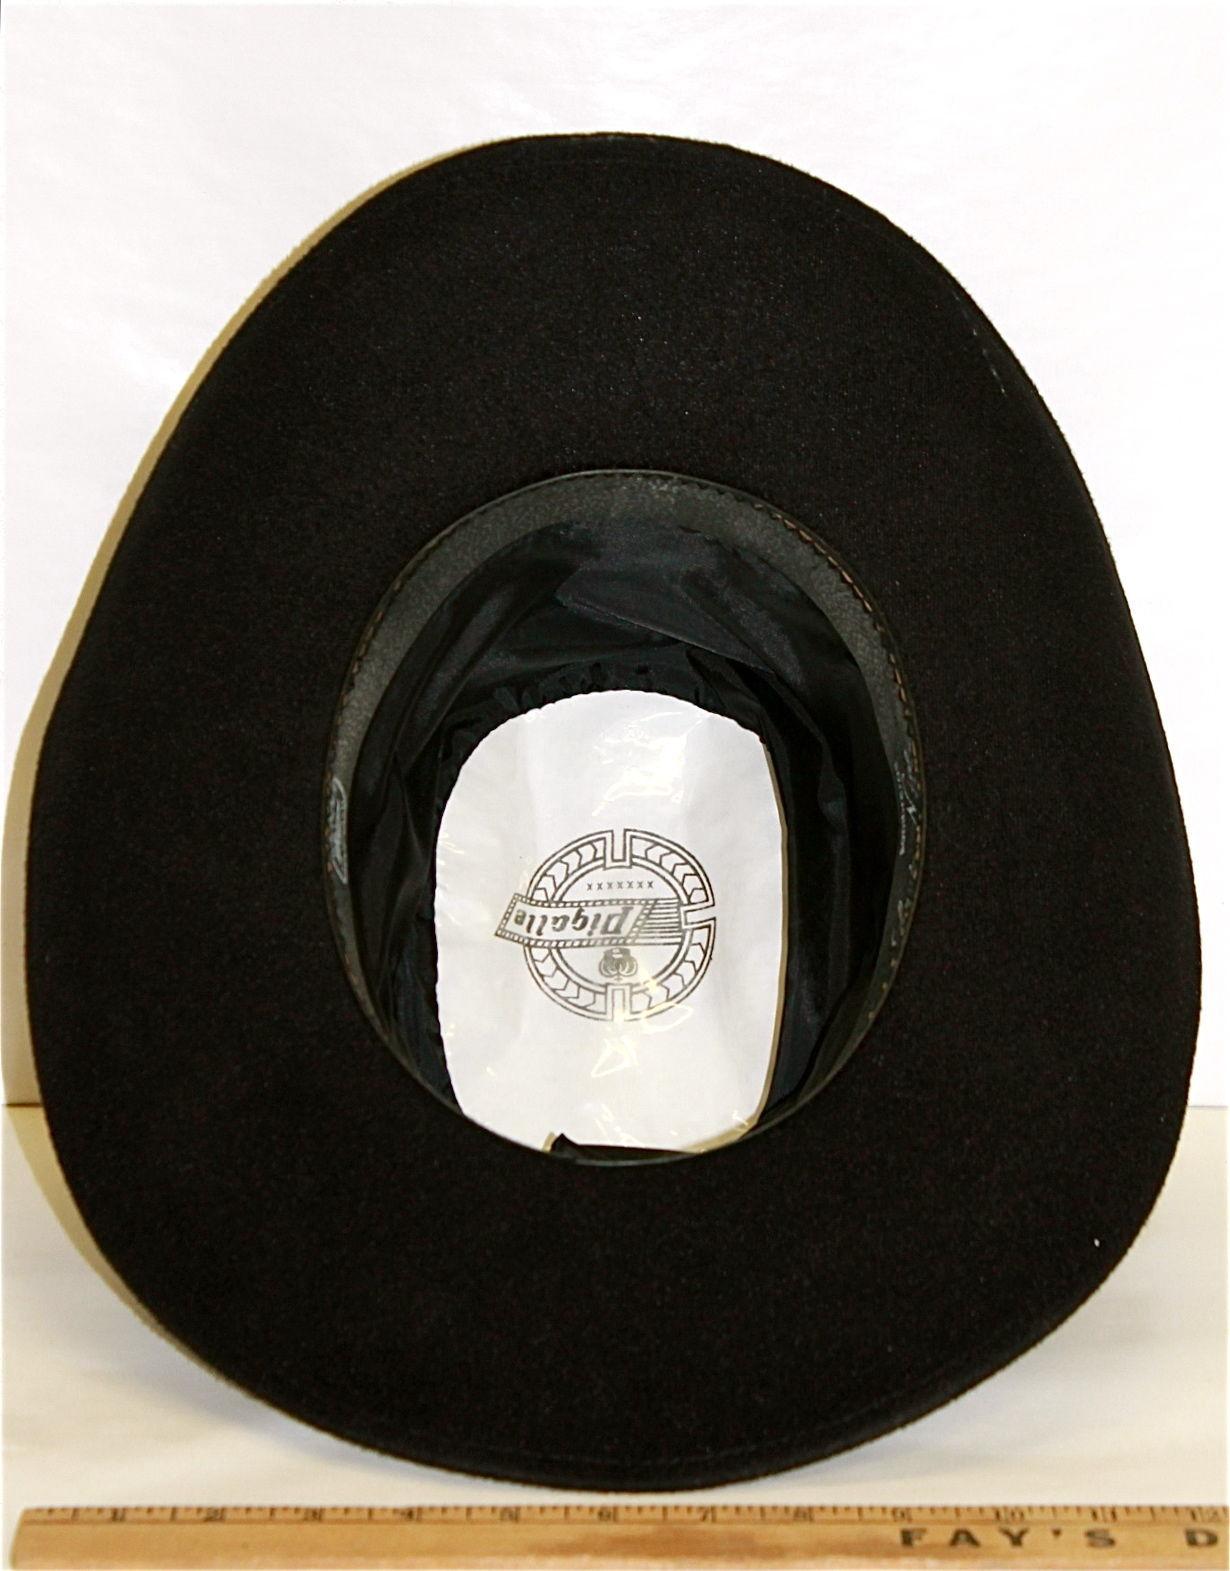 Men s Black Western Cowboy Hat Pigalle Santo Nino Sombrero Mexico Felt Lg 7  3 8 a3e56ee5be11